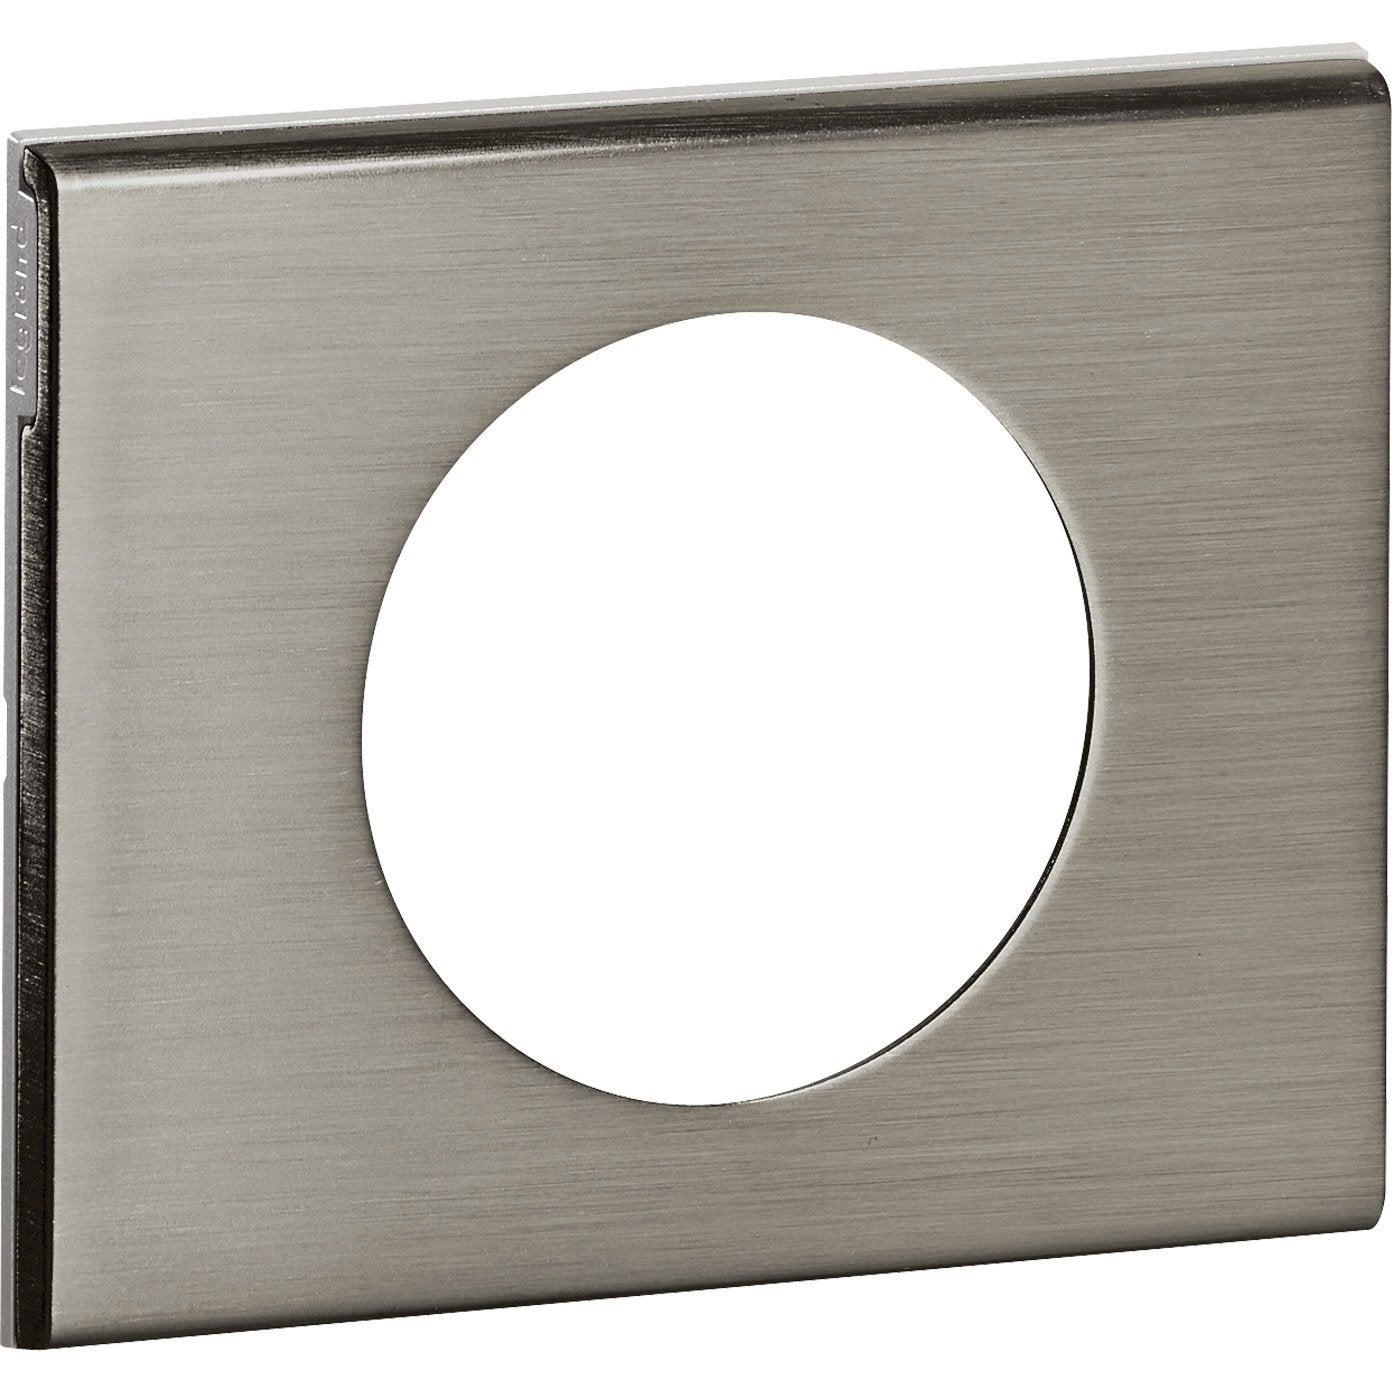 plaque simple c liane legrand inox bross leroy merlin. Black Bedroom Furniture Sets. Home Design Ideas